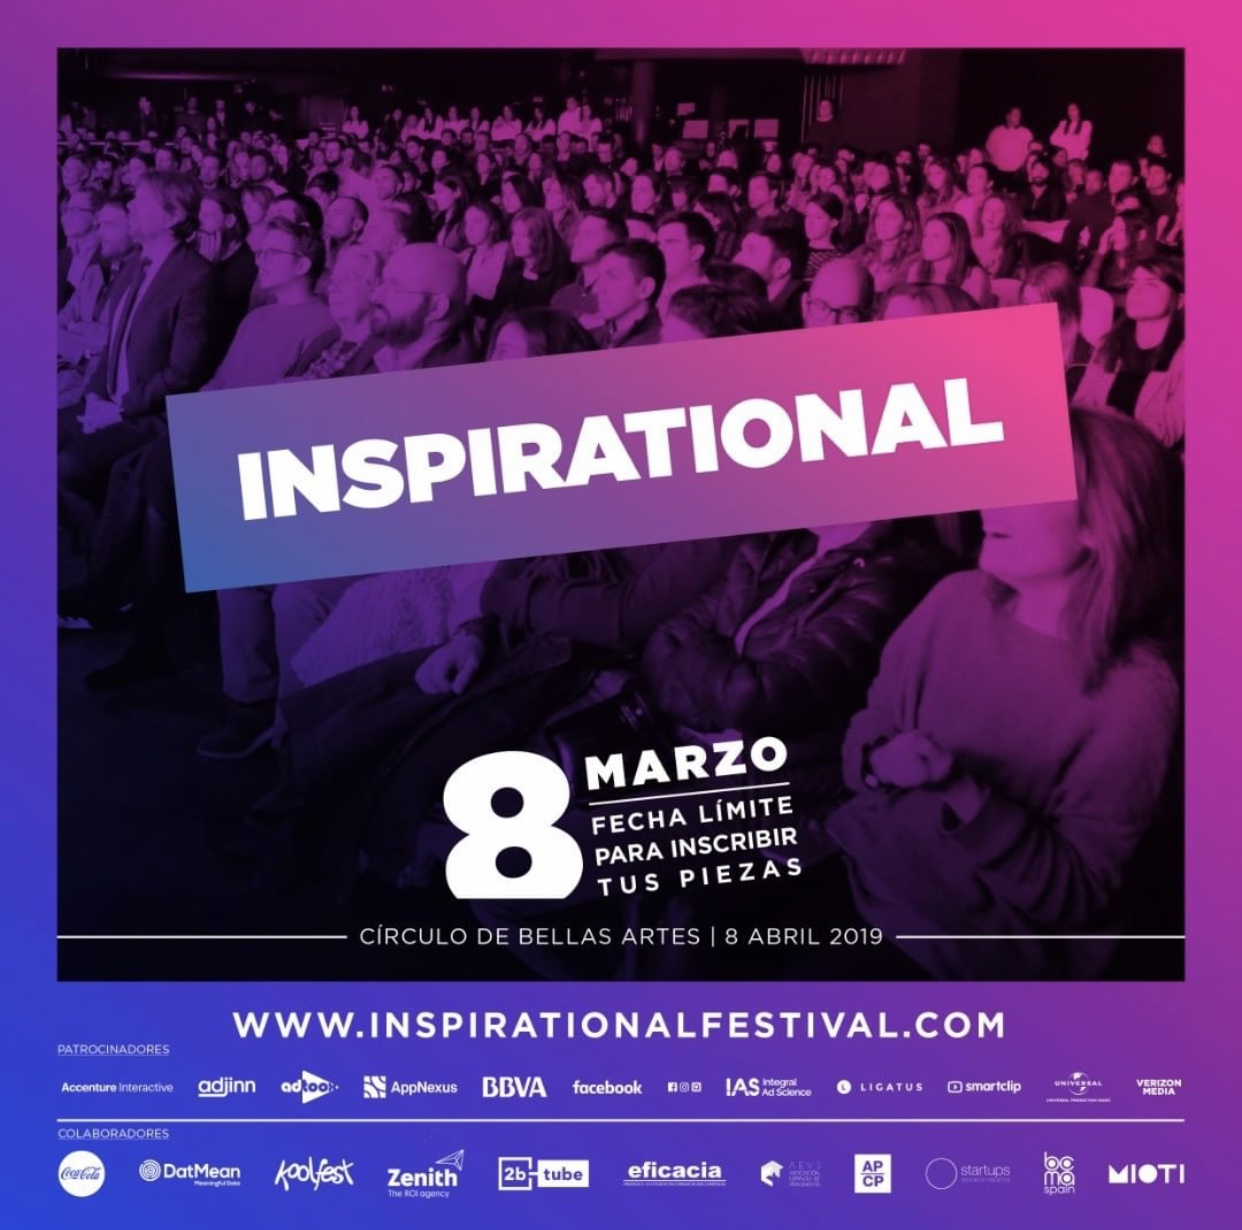 DatMean colabora como patrocinador en el Inspirational Festival